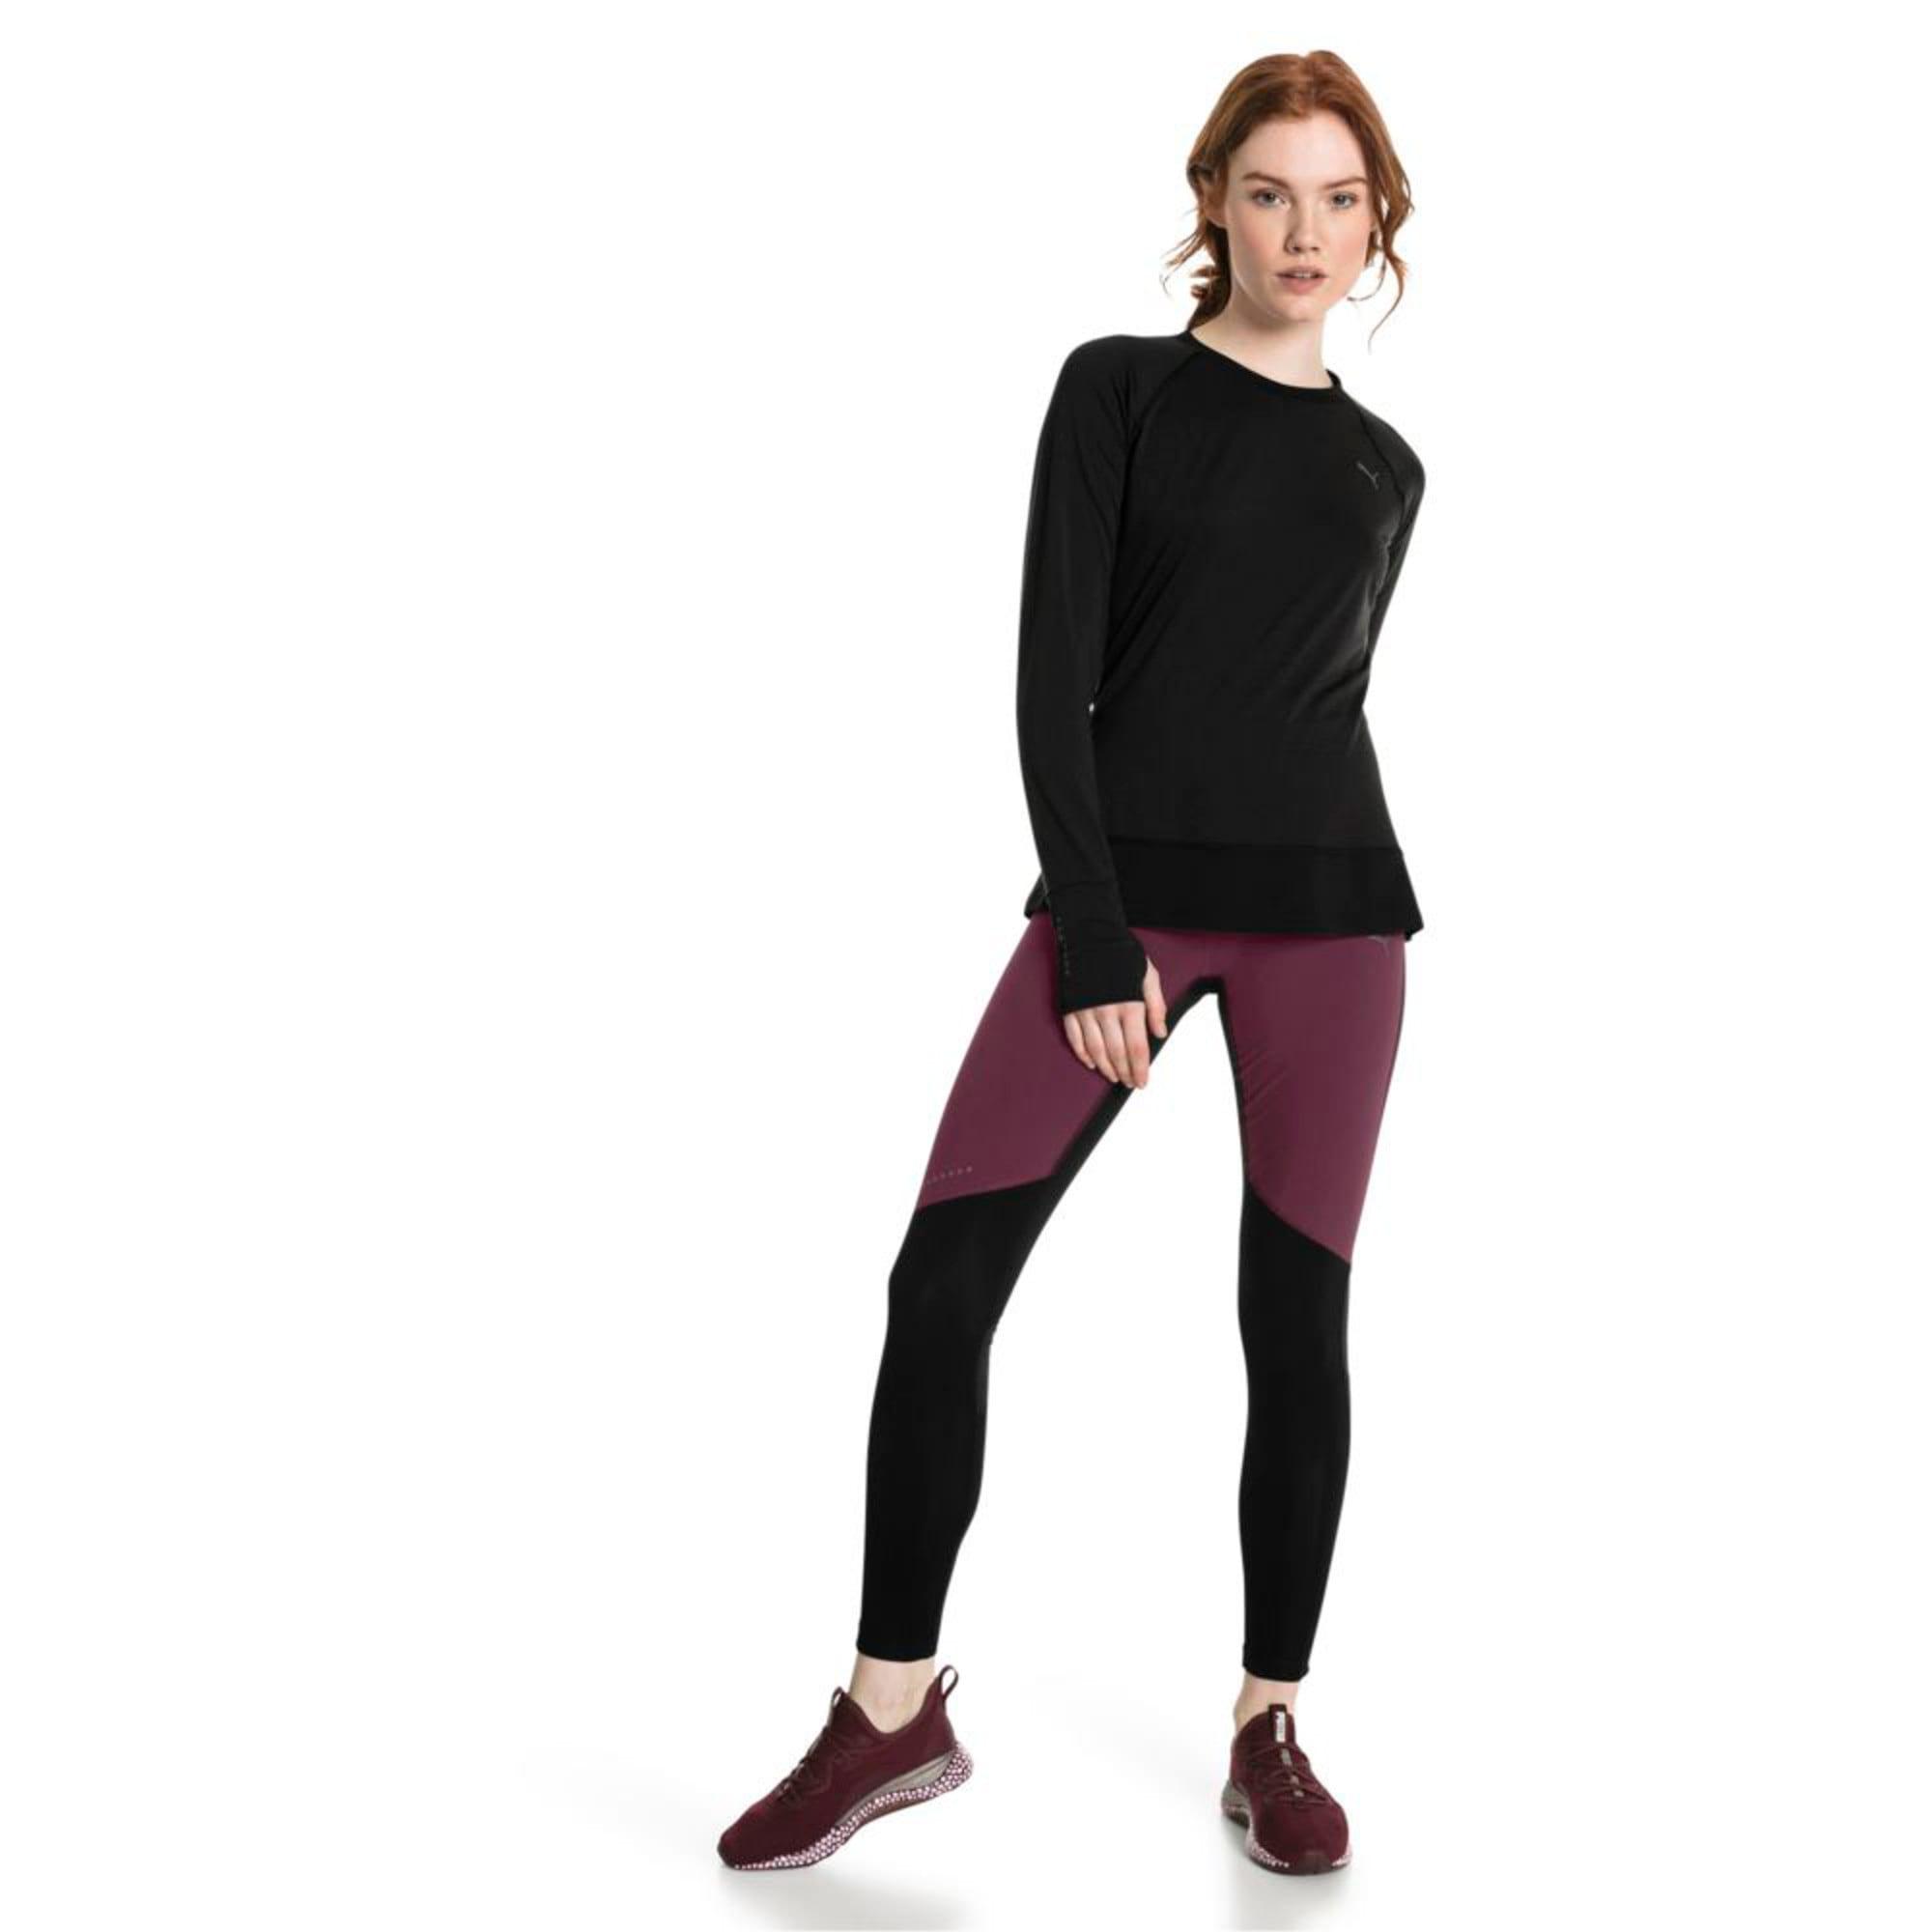 Thumbnail 3 of Winter Long Sleeve Women's Training Top, Puma Black, medium-IND